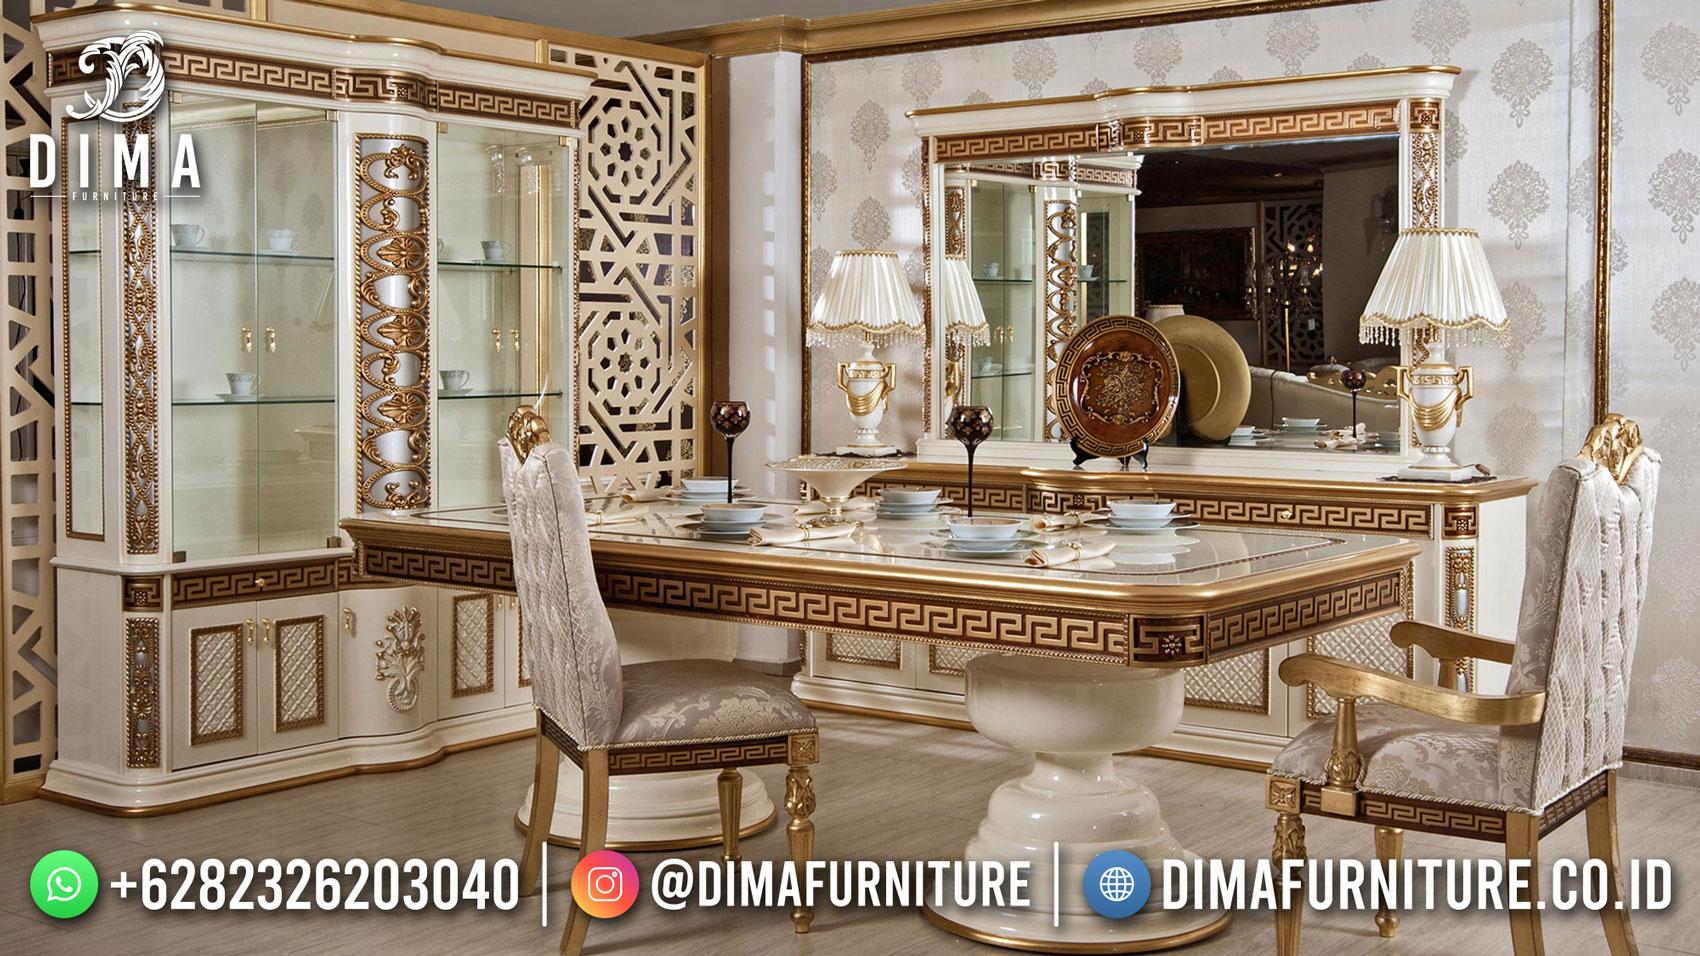 Great Design Set Meja Makan Mewah Jepara Luxury Gold Color Combination BT-1203